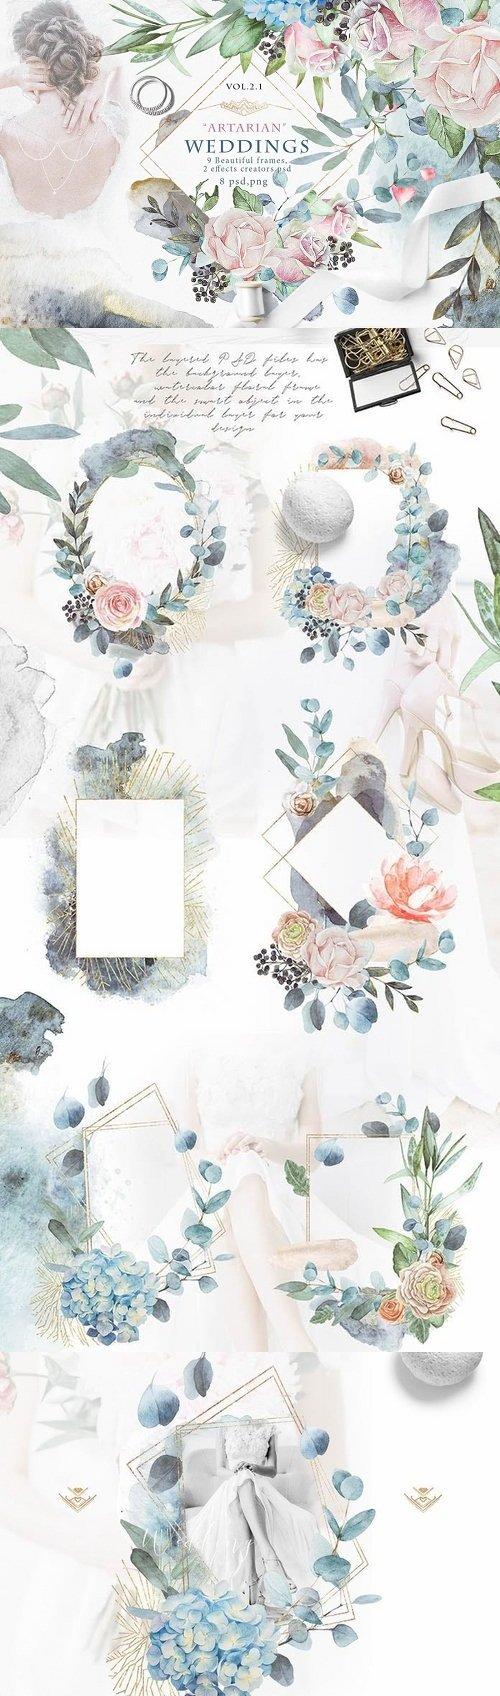 "Wedding frames ""ARTARIAN"" vol.2.1"